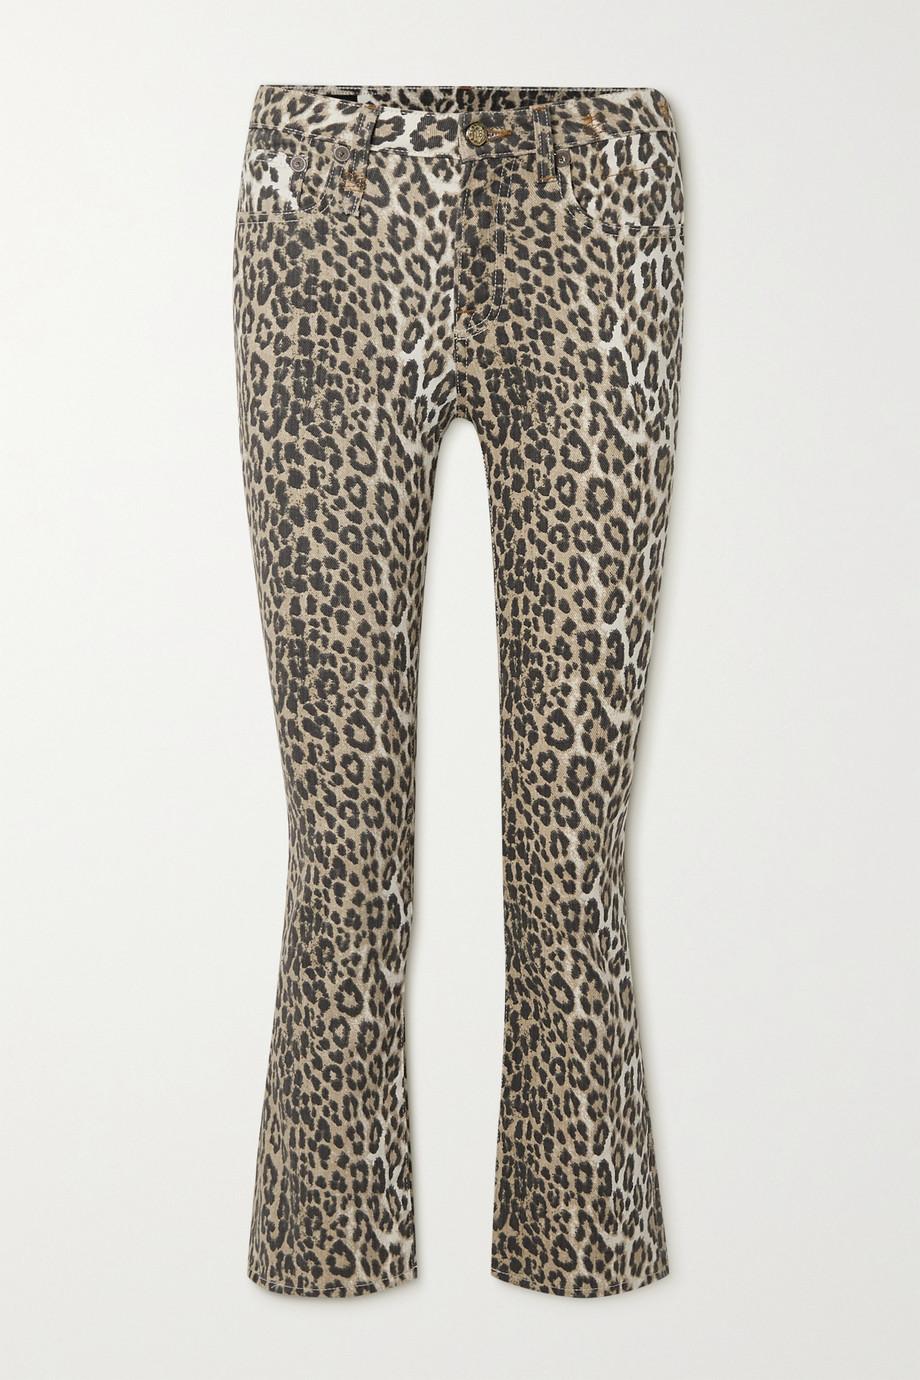 R13 Kick Fit halbhohe Schlagjeans mit Leopardenprint